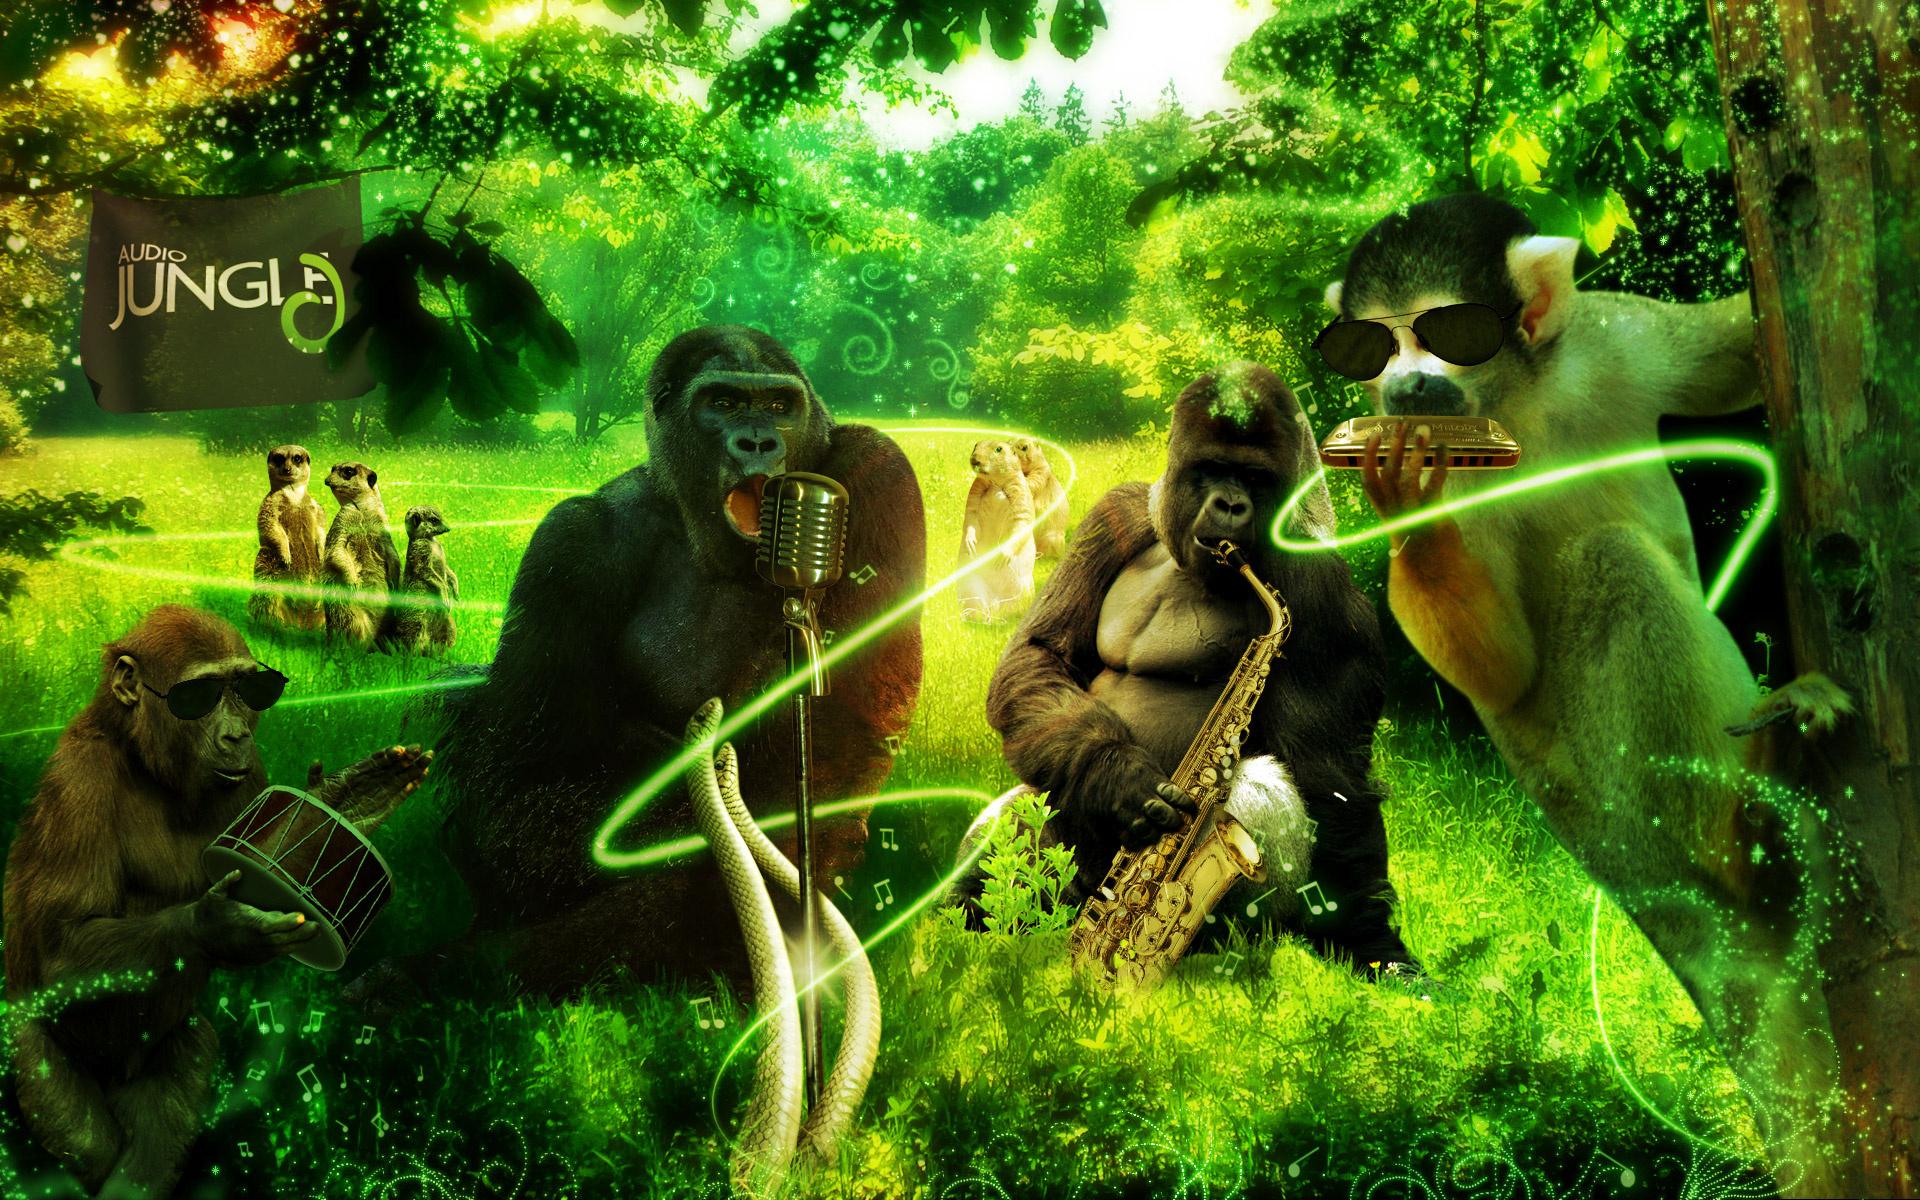 Hd Animal Wallpapers Hd Music Wallpapers: Jungle Animals Wallpaper